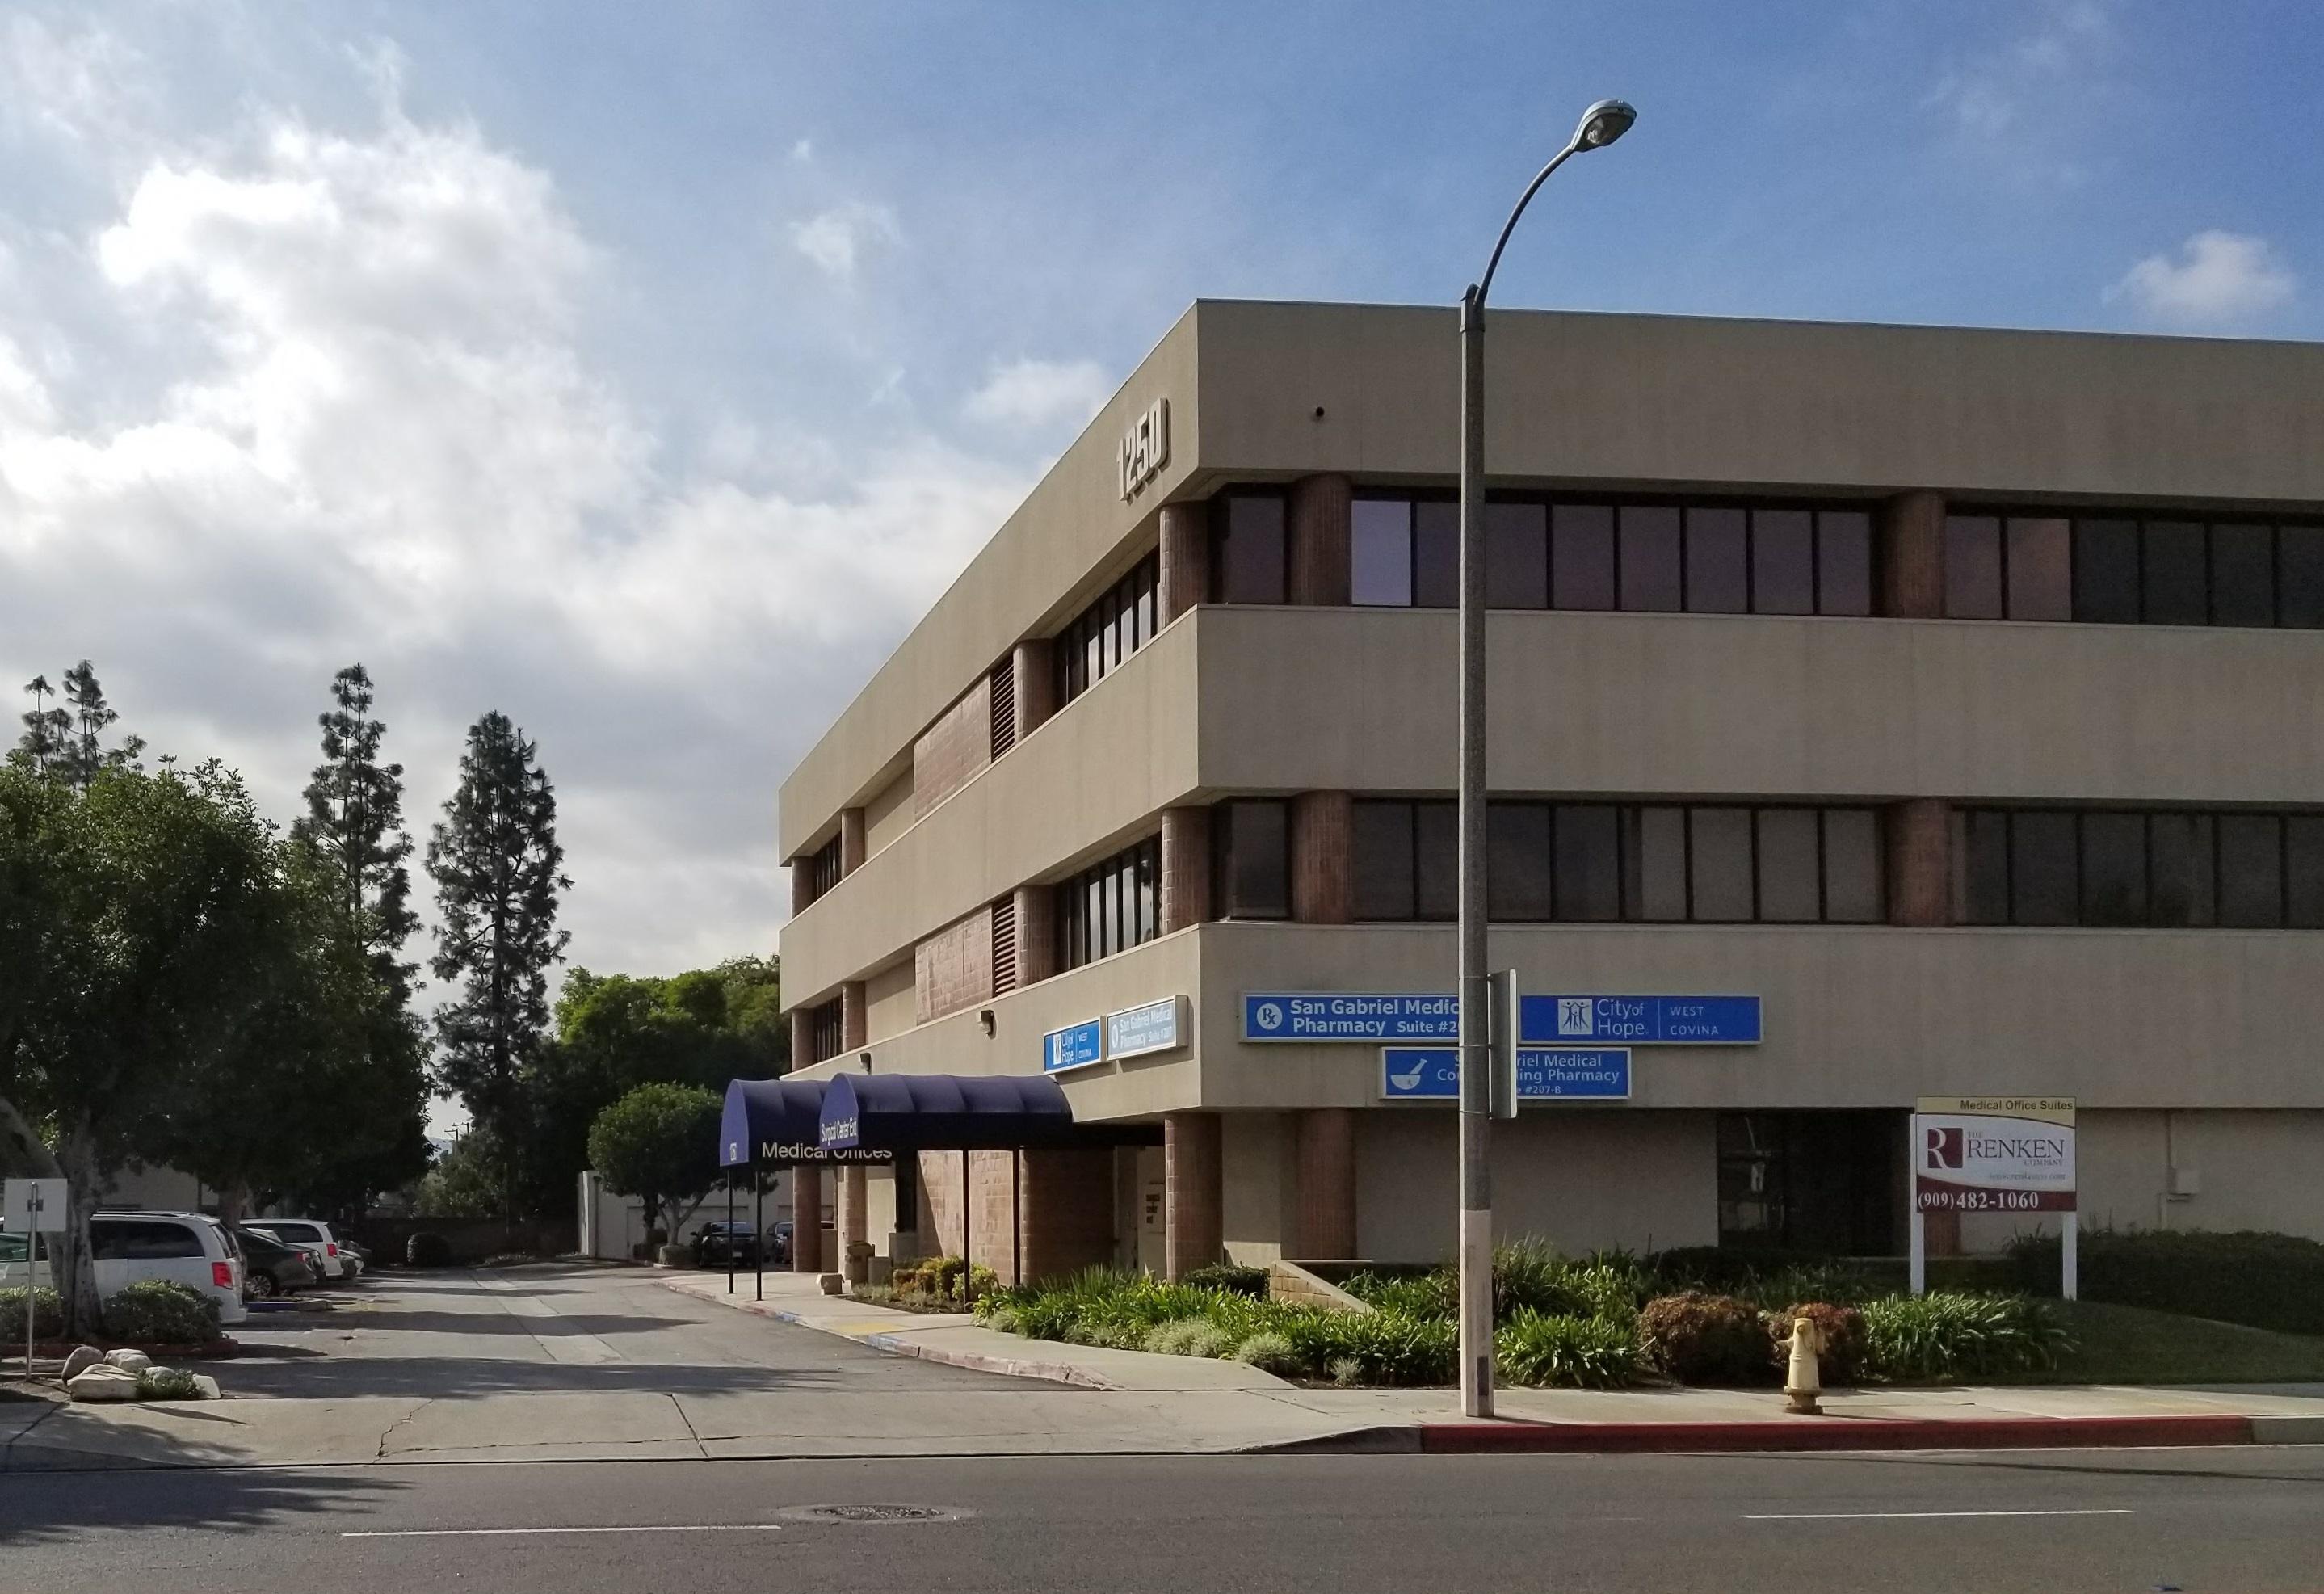 West Covina sleep center 1250 - Advanced Sleep Medicine Services - Building